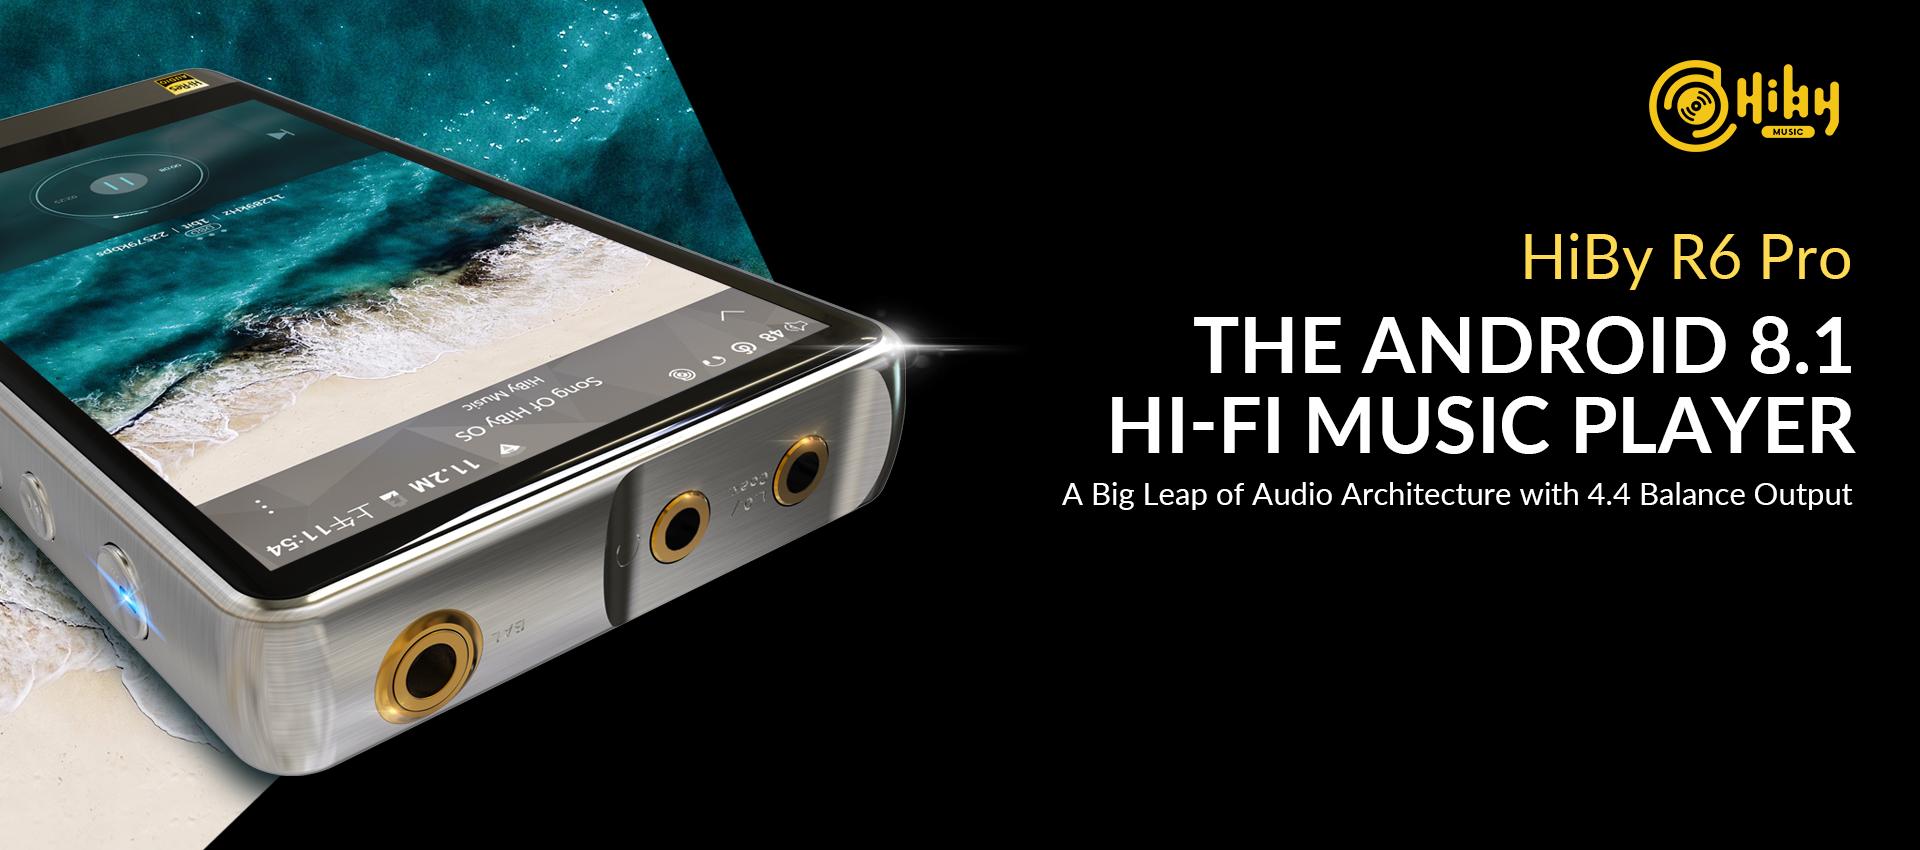 Hiby R6 Pro HI-FI MUSIC PLAYER : Sound Proof Bros